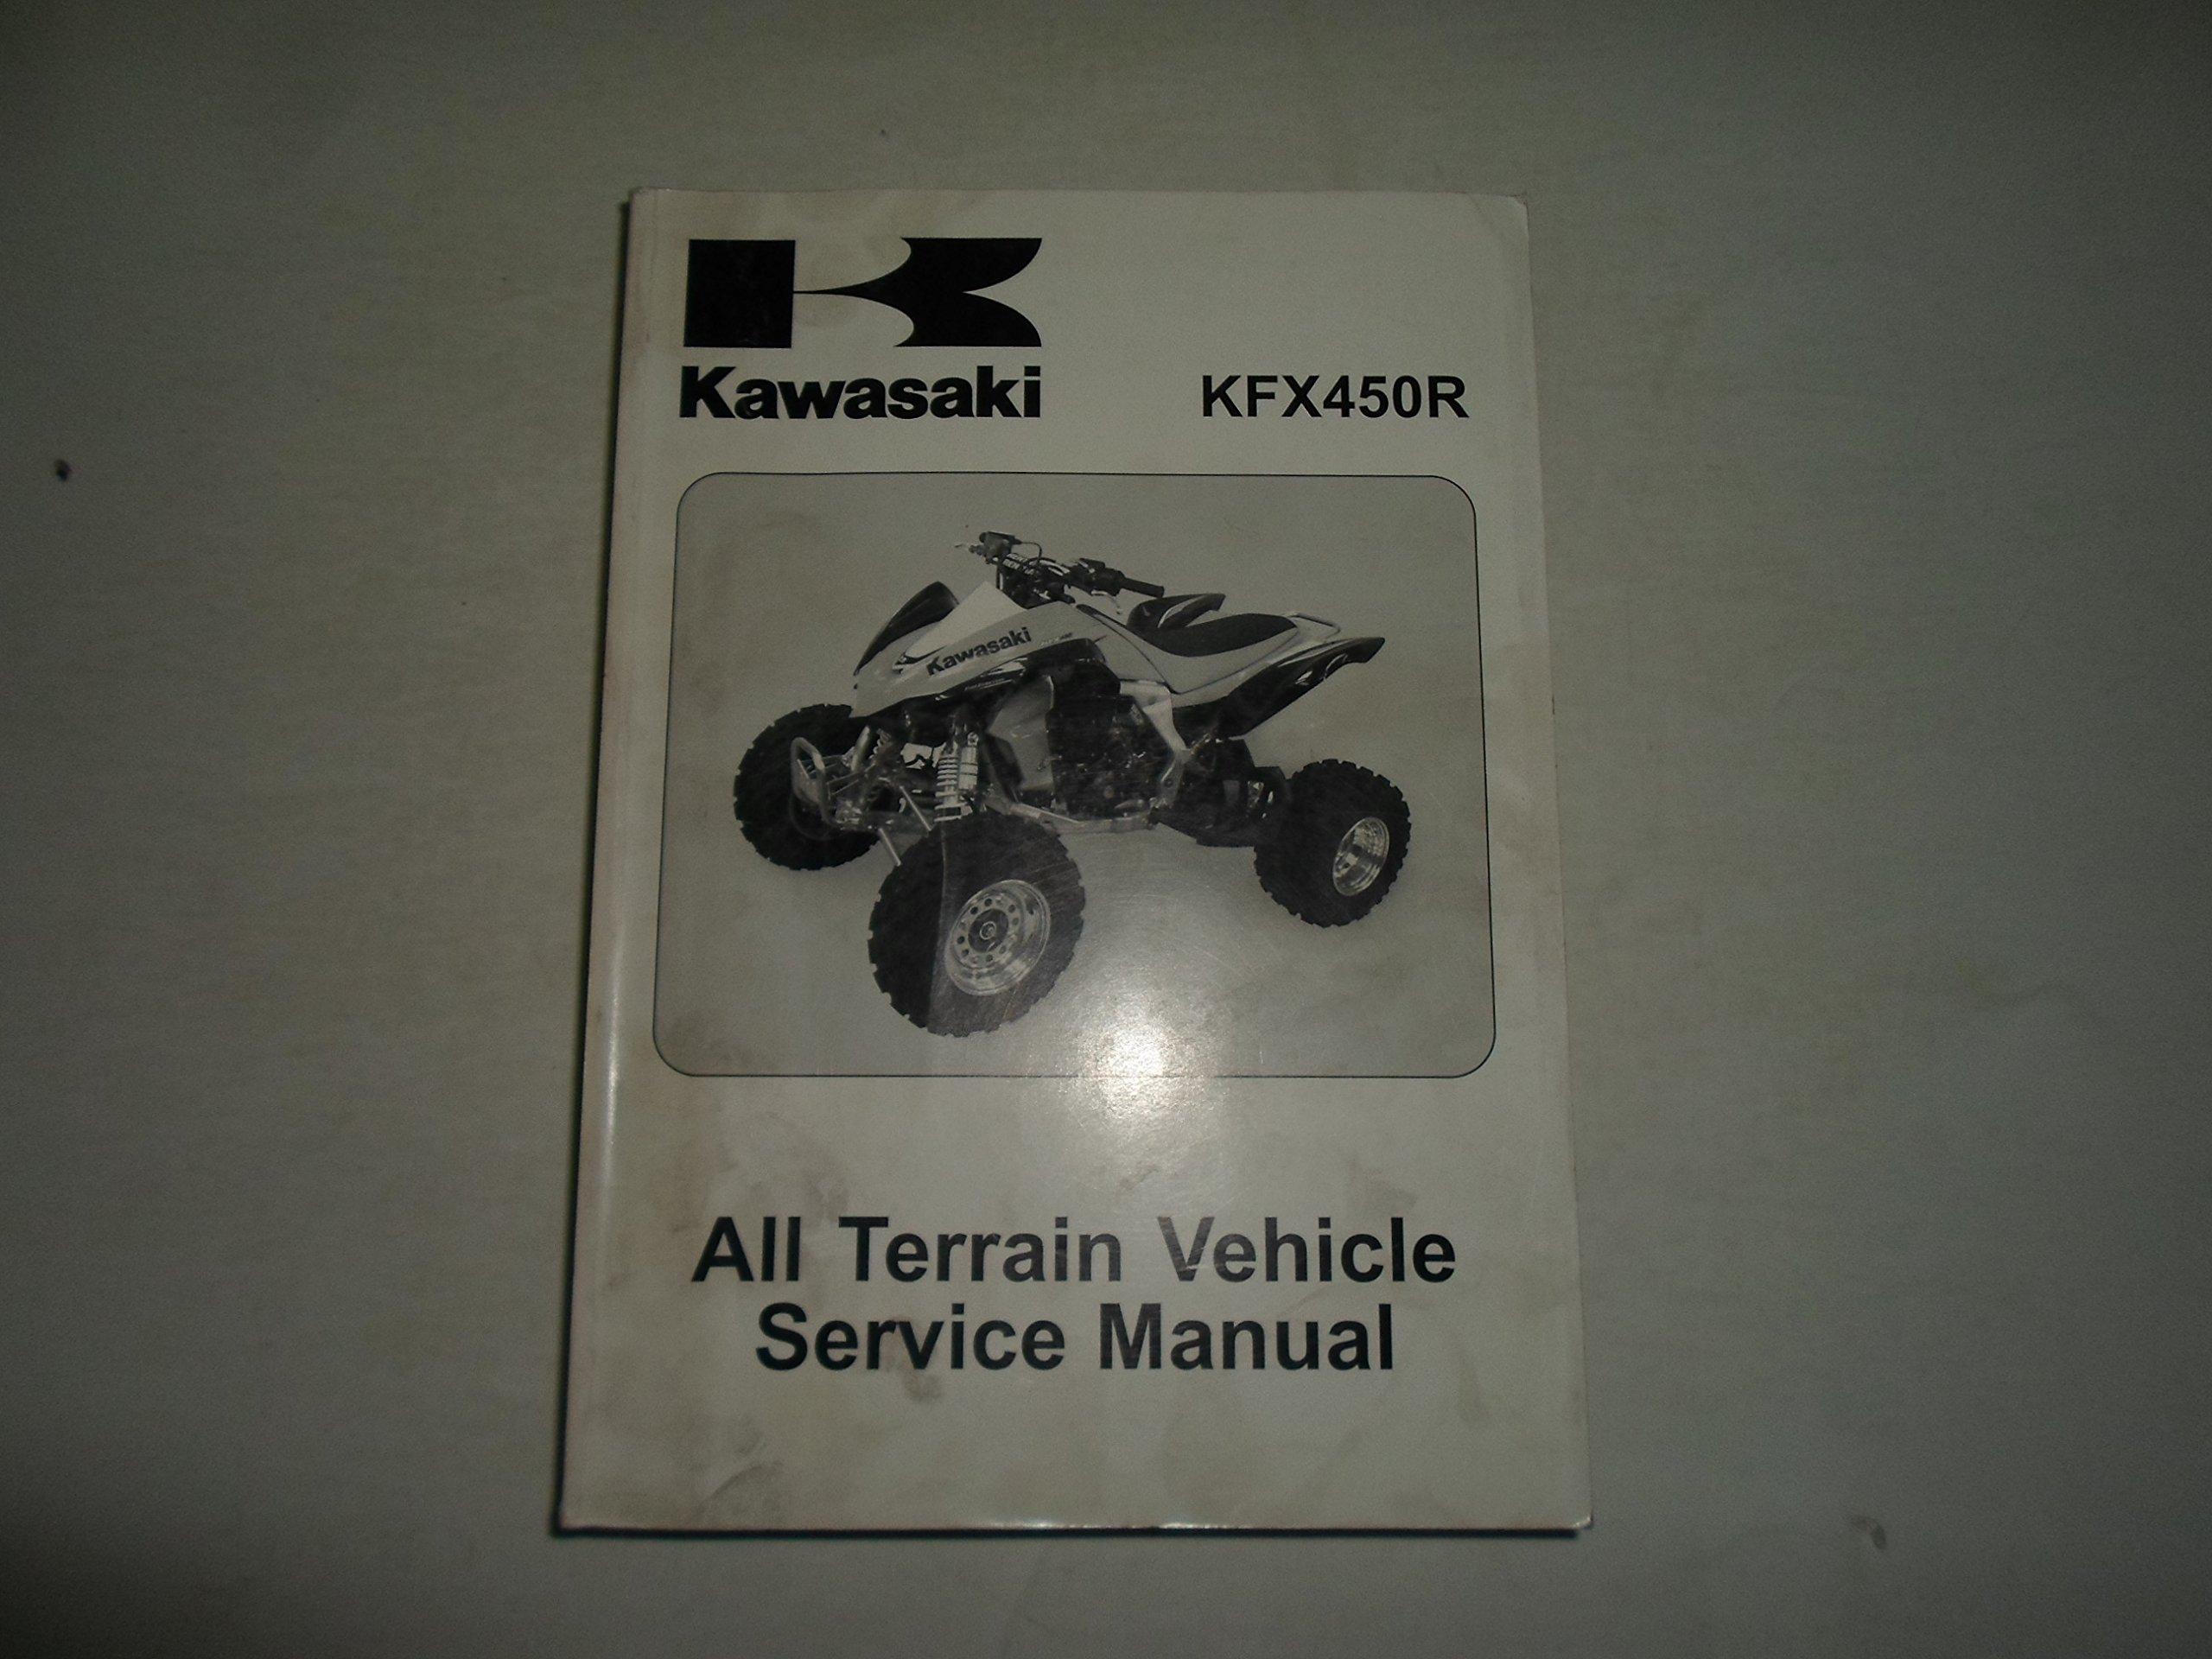 2008 Kawasaki KFX450R All Terrain Vehicle Service Repair Shop Manual  STAINED: KAWASAKI: Amazon.com: Books